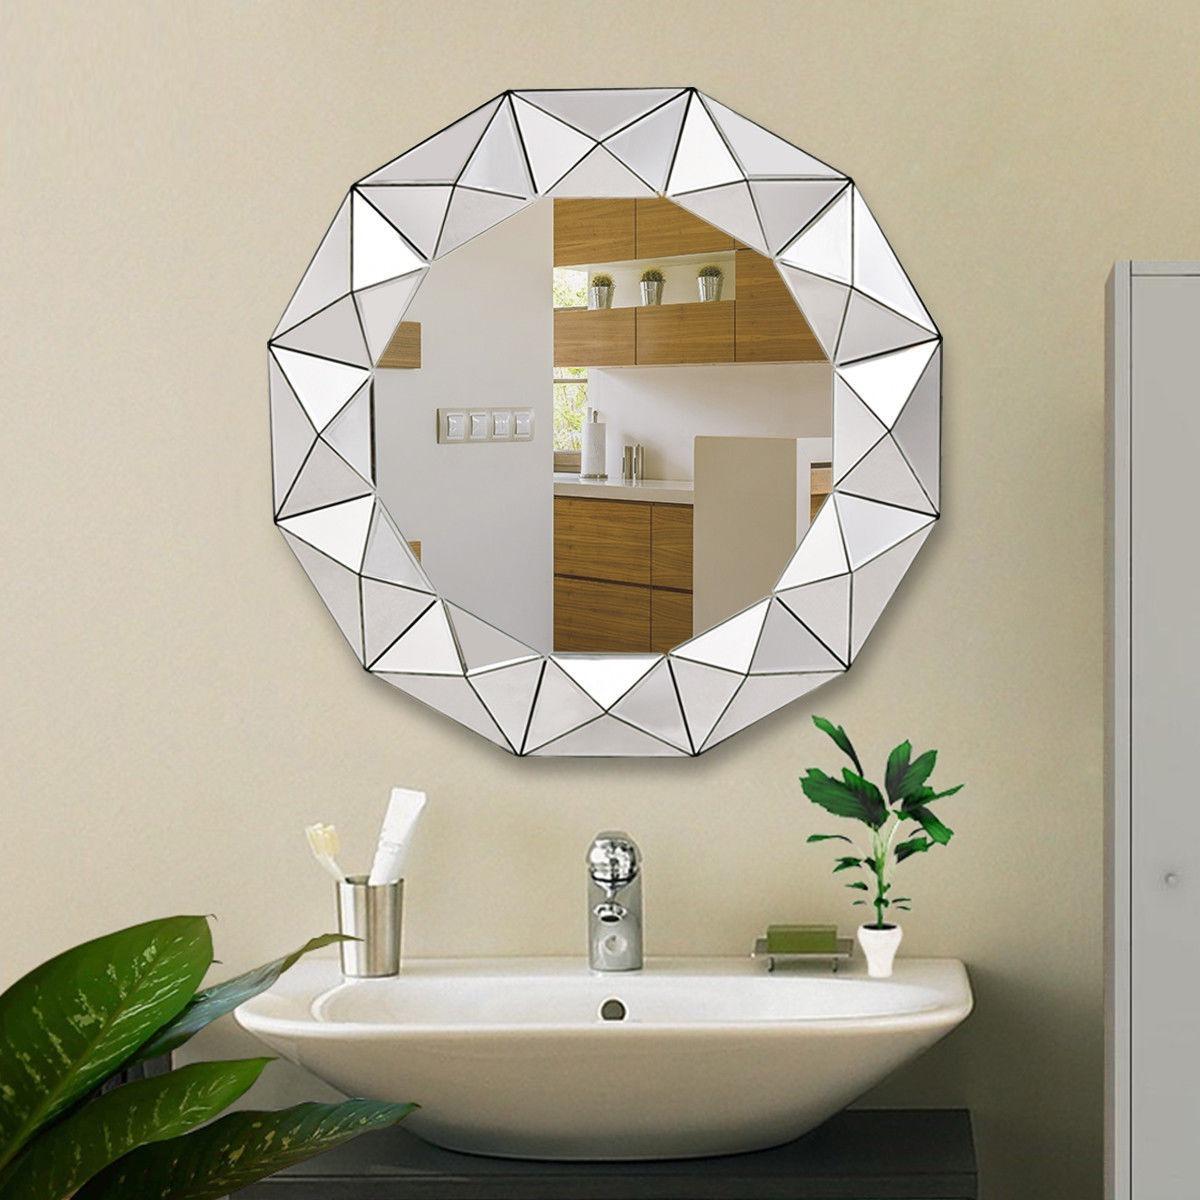 Espejo para ba o redondo biselado 31 5 diametro 3 080 - Lamparas para espejos de bano ...